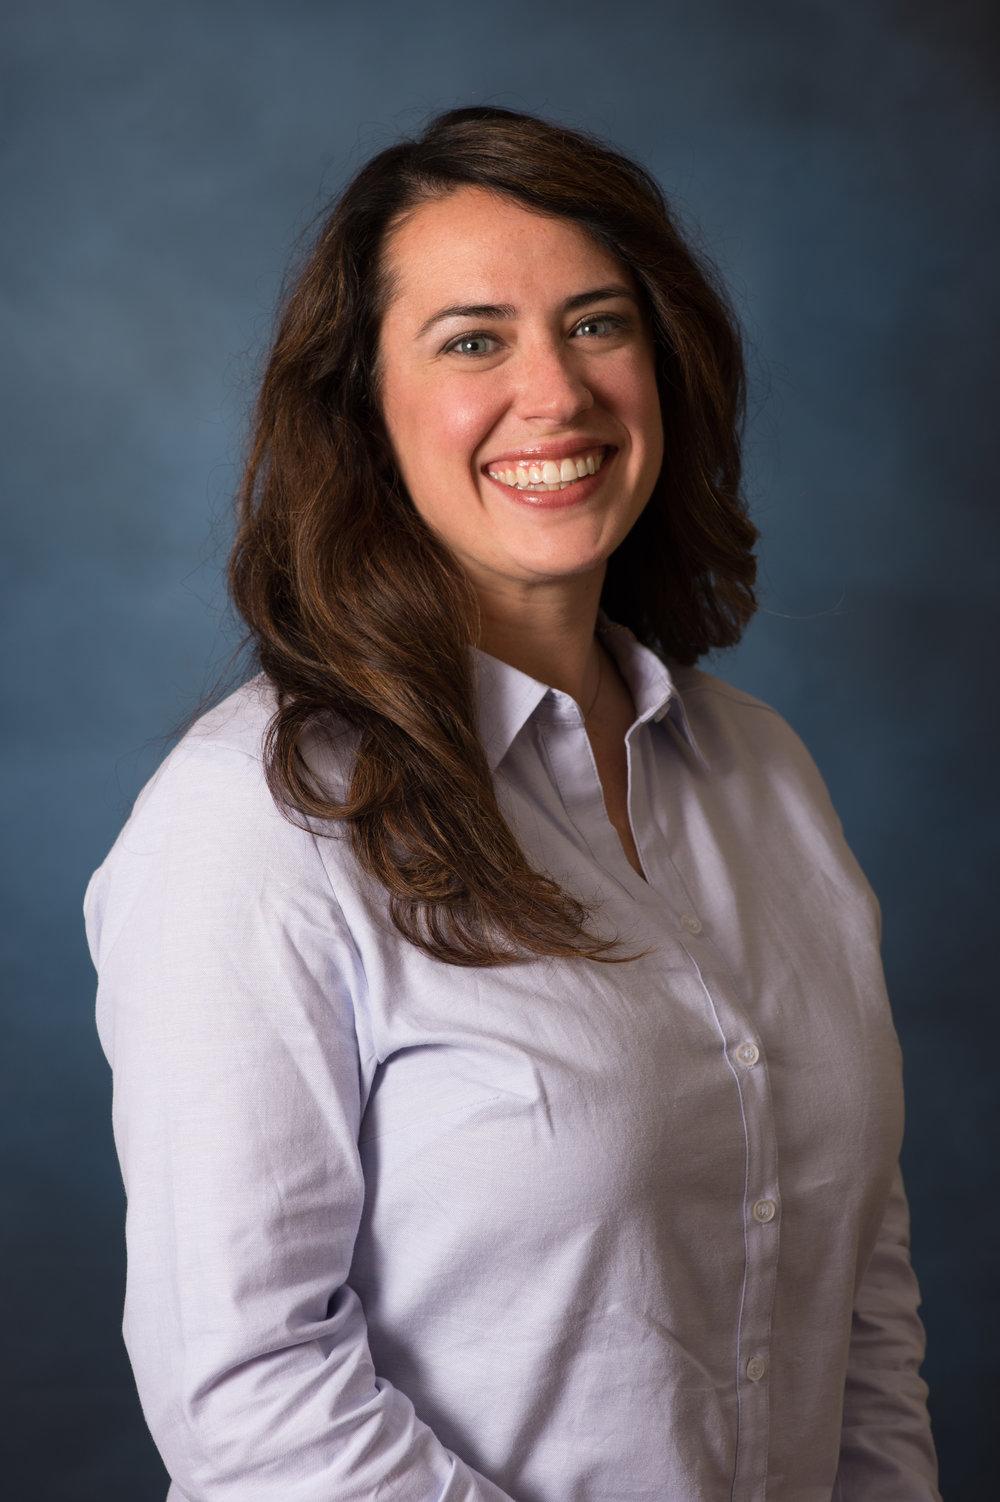 Sarah Bane, Youth Director